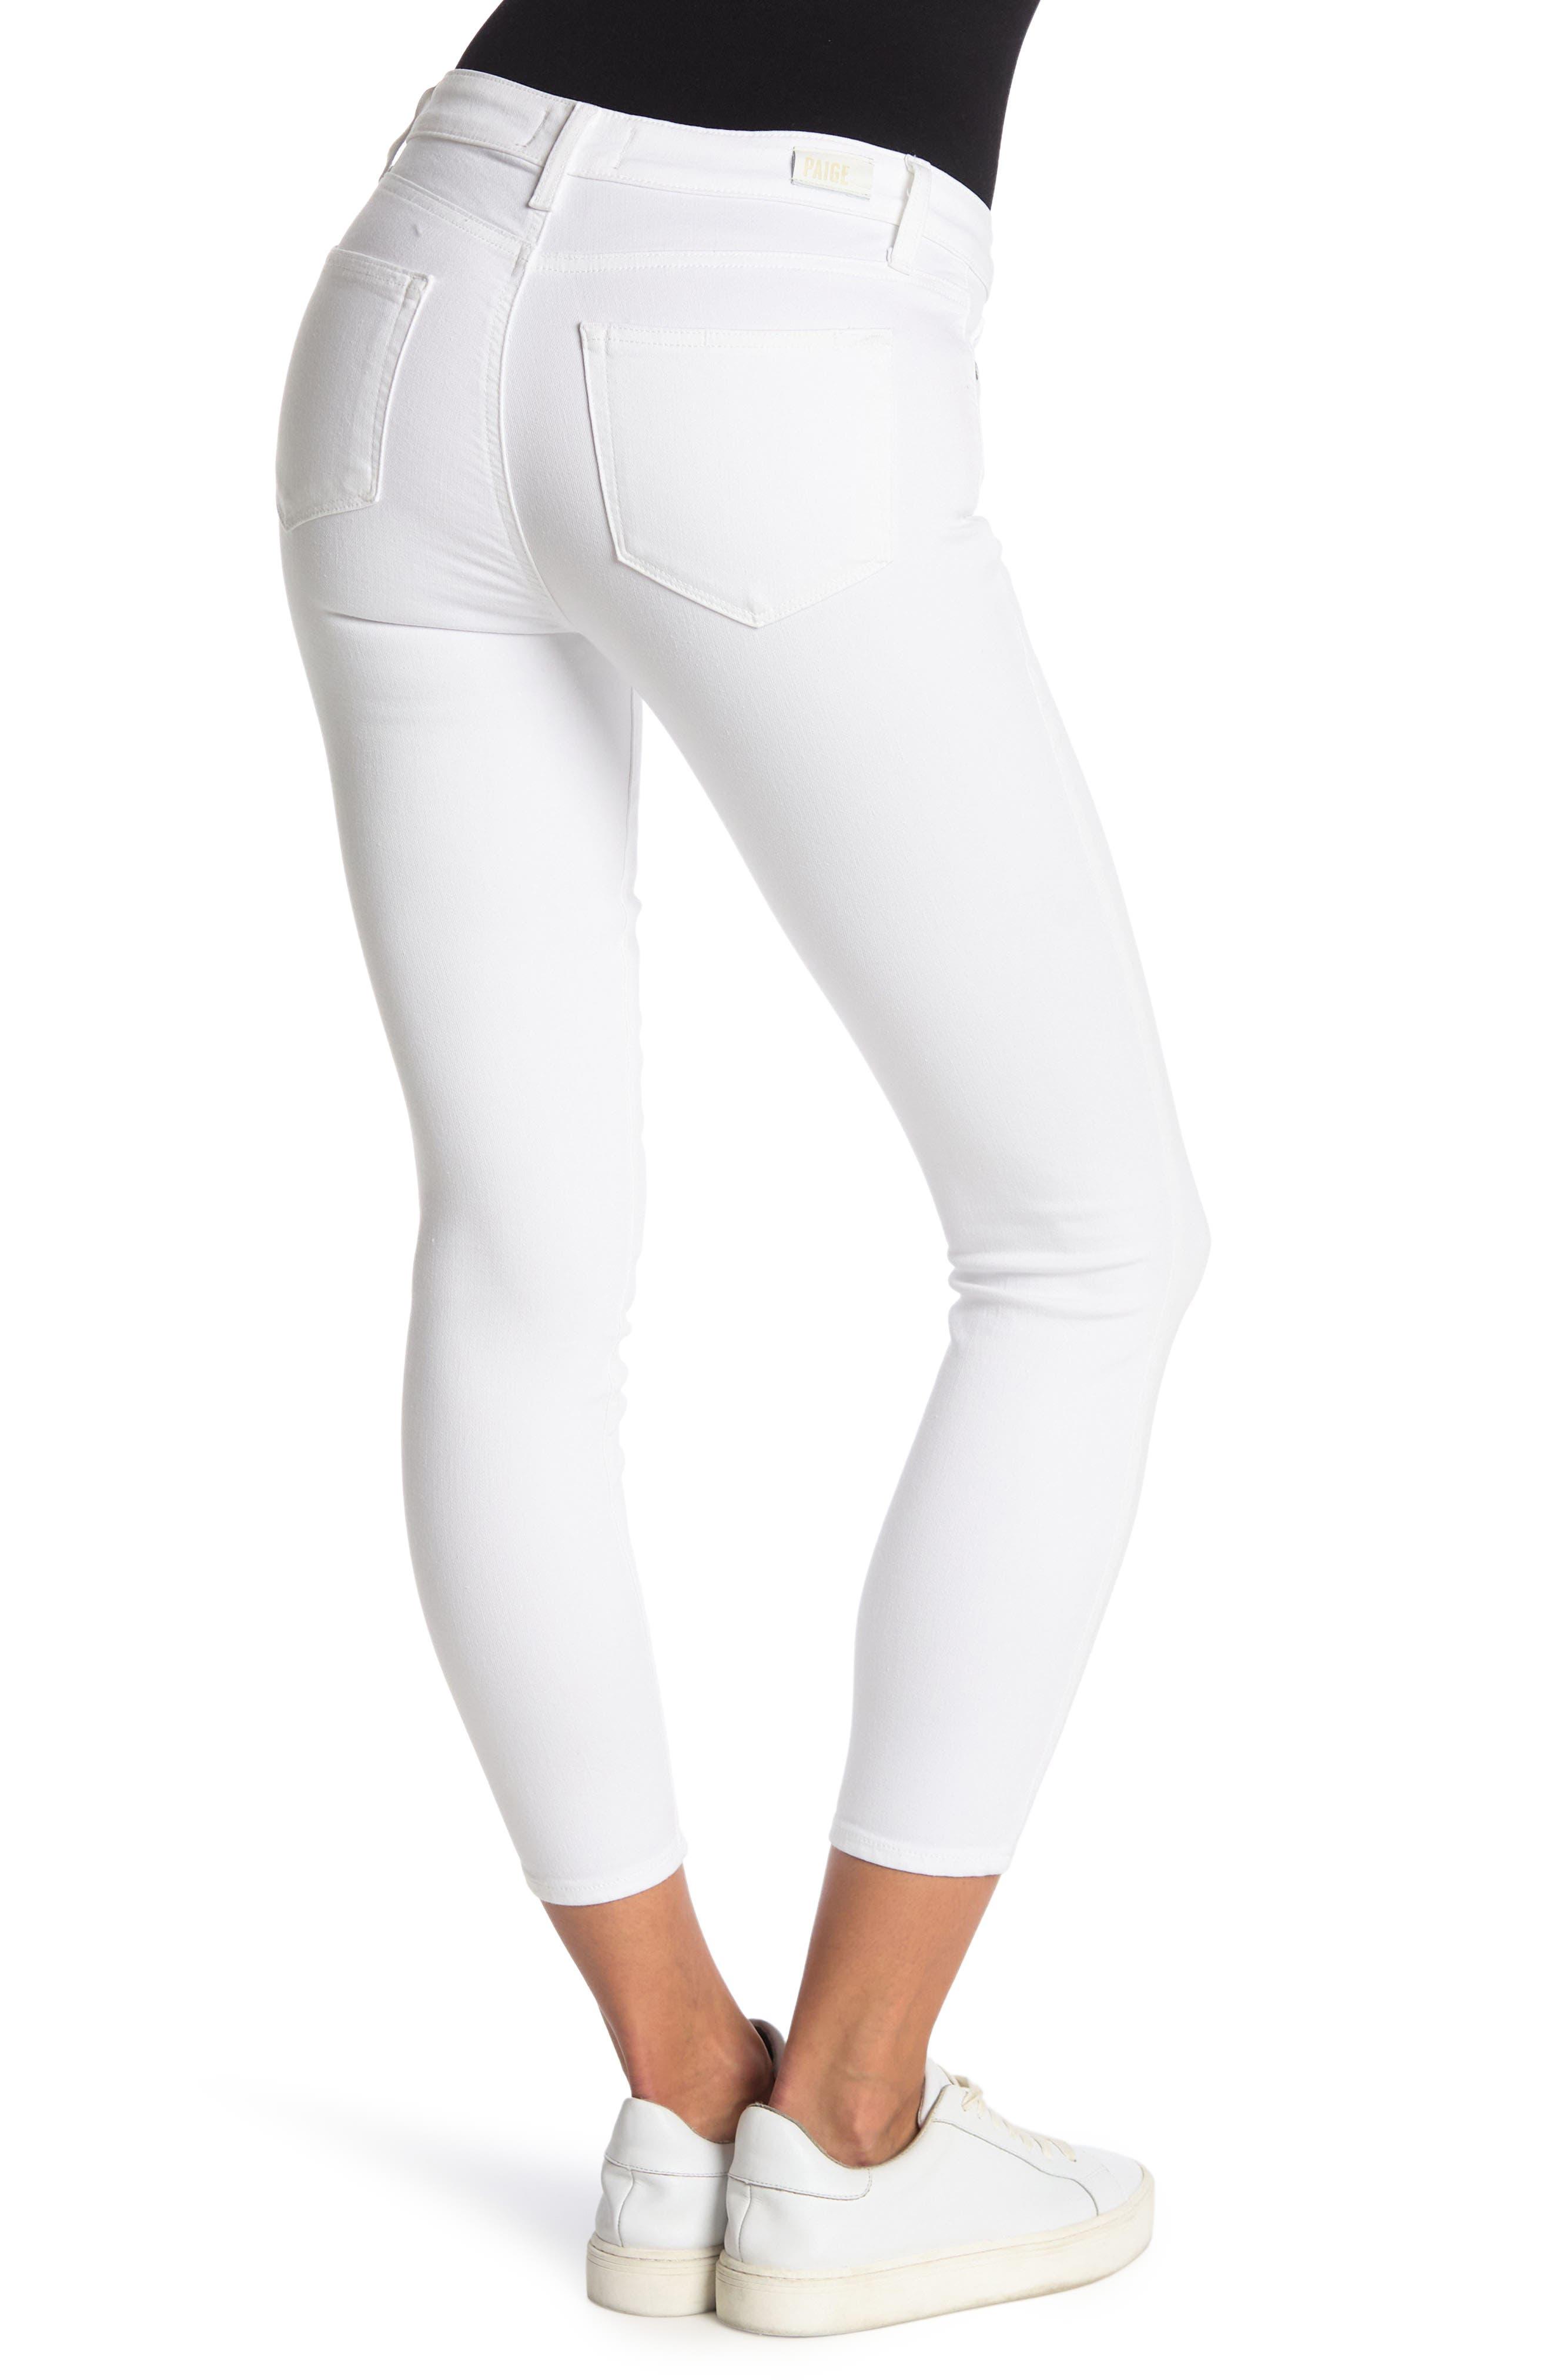 Image of PAIGE Verdugo Crop Jeans